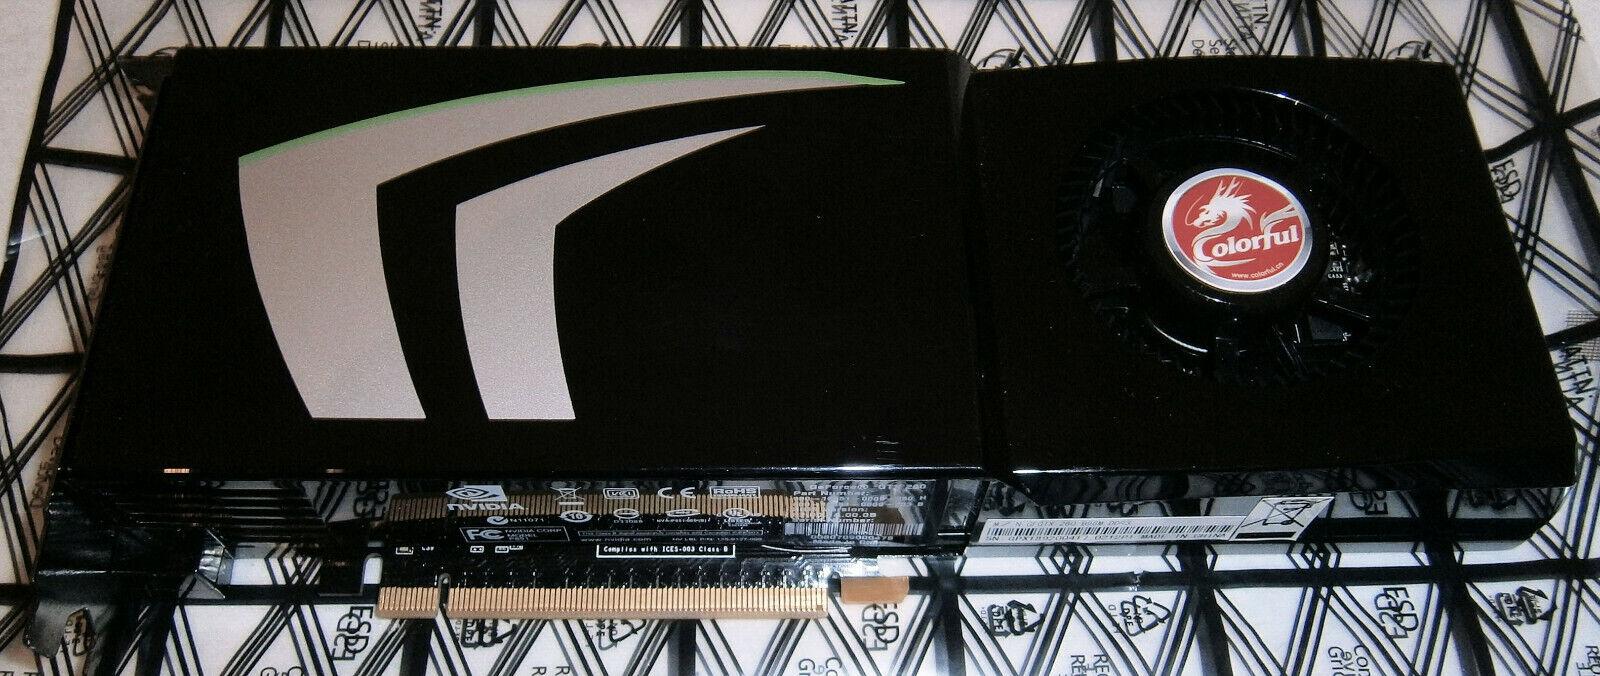 ZOTAC - NVIDIA GeForce GTX 260 - 896MB GDDR3 - DVI GRAFIKKARTE 885